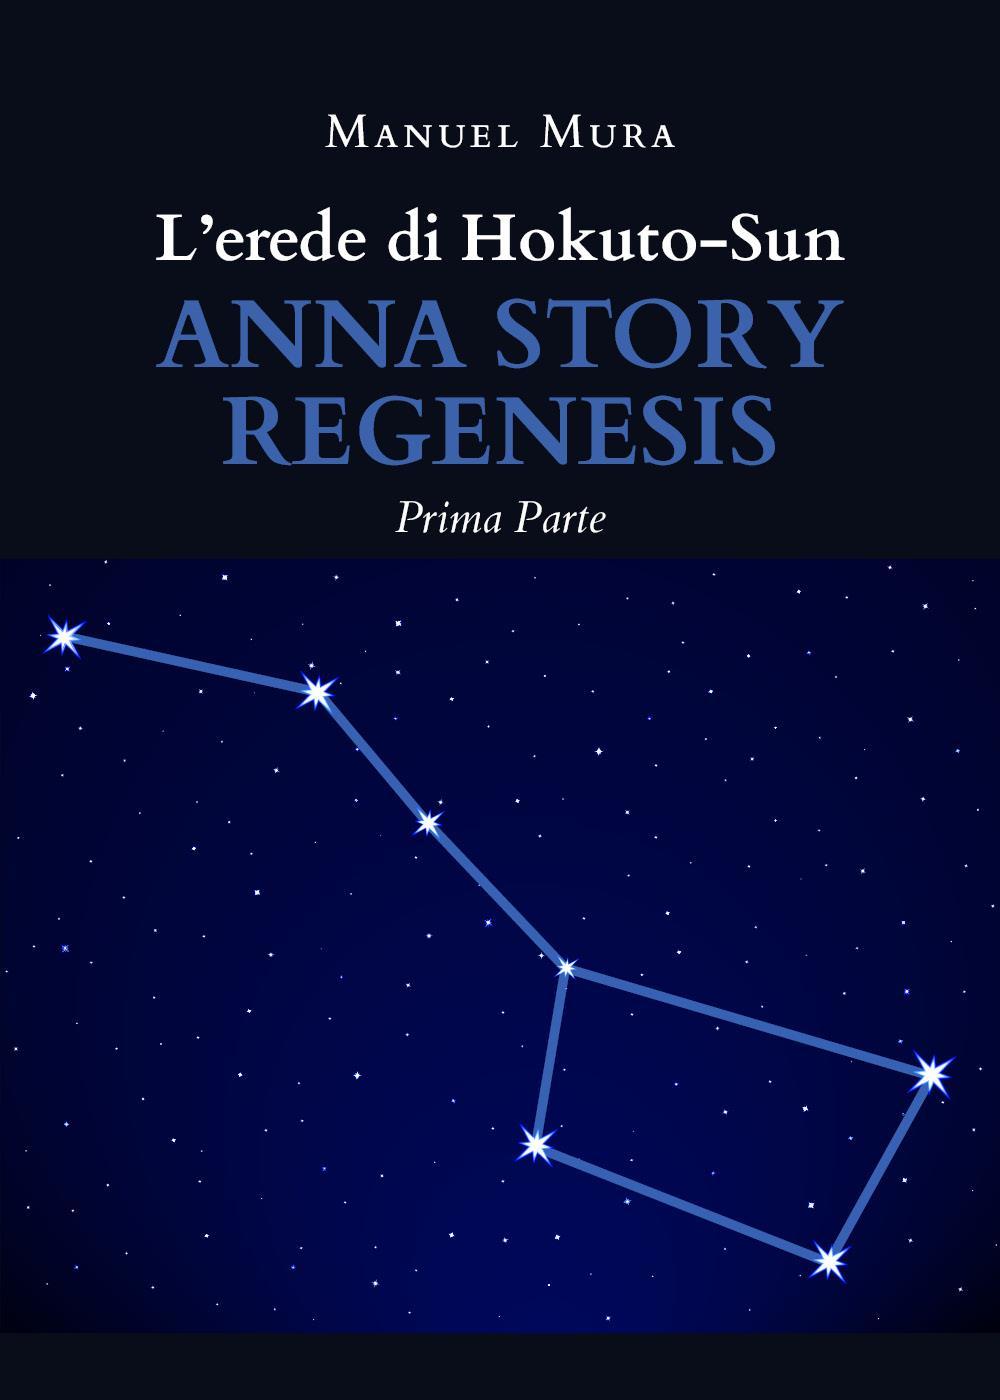 L'erede di Hokuto-Sun. Anna story regenesis (prima parte)